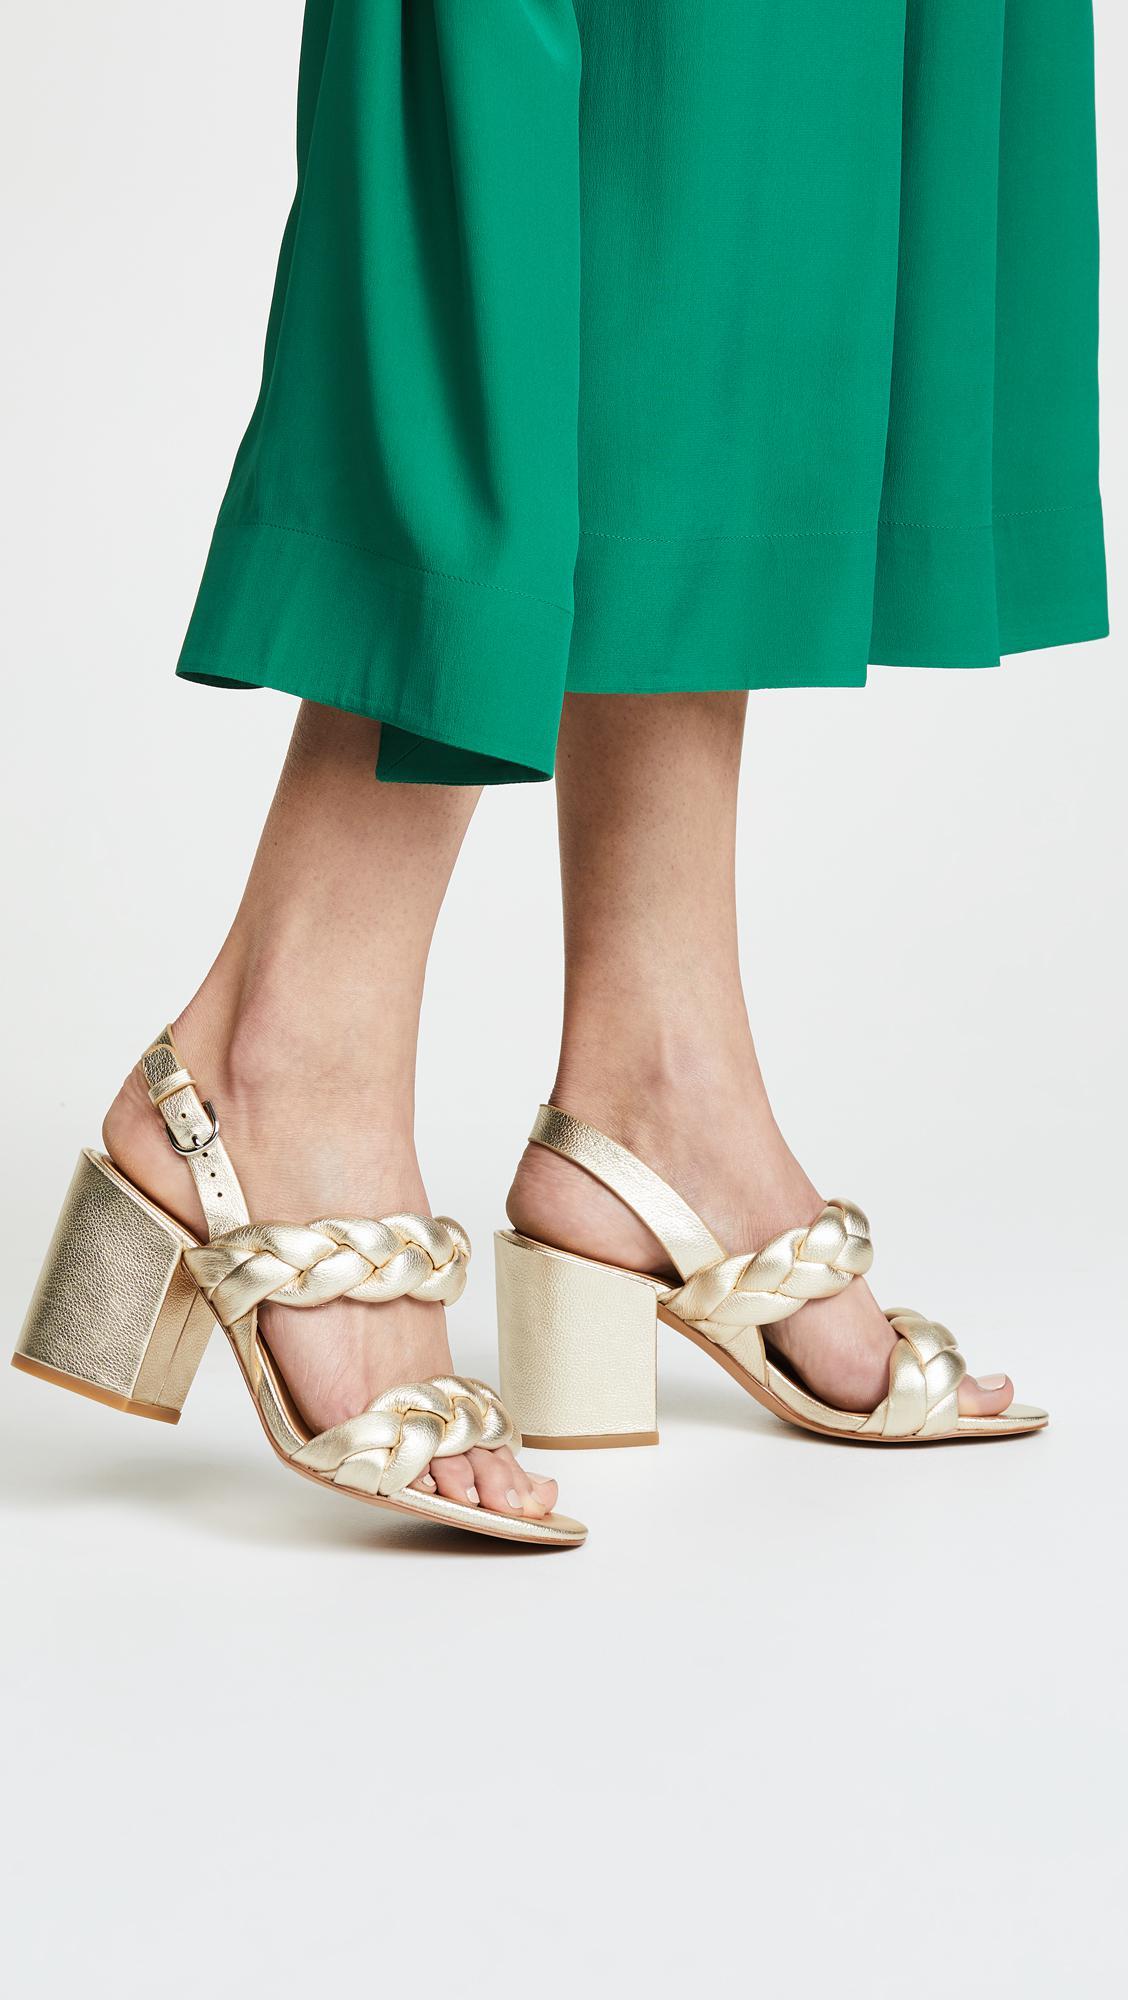 Rebecca Minkoff Women's Candace Suede Slingback Block Heel Sandals wLNTMm